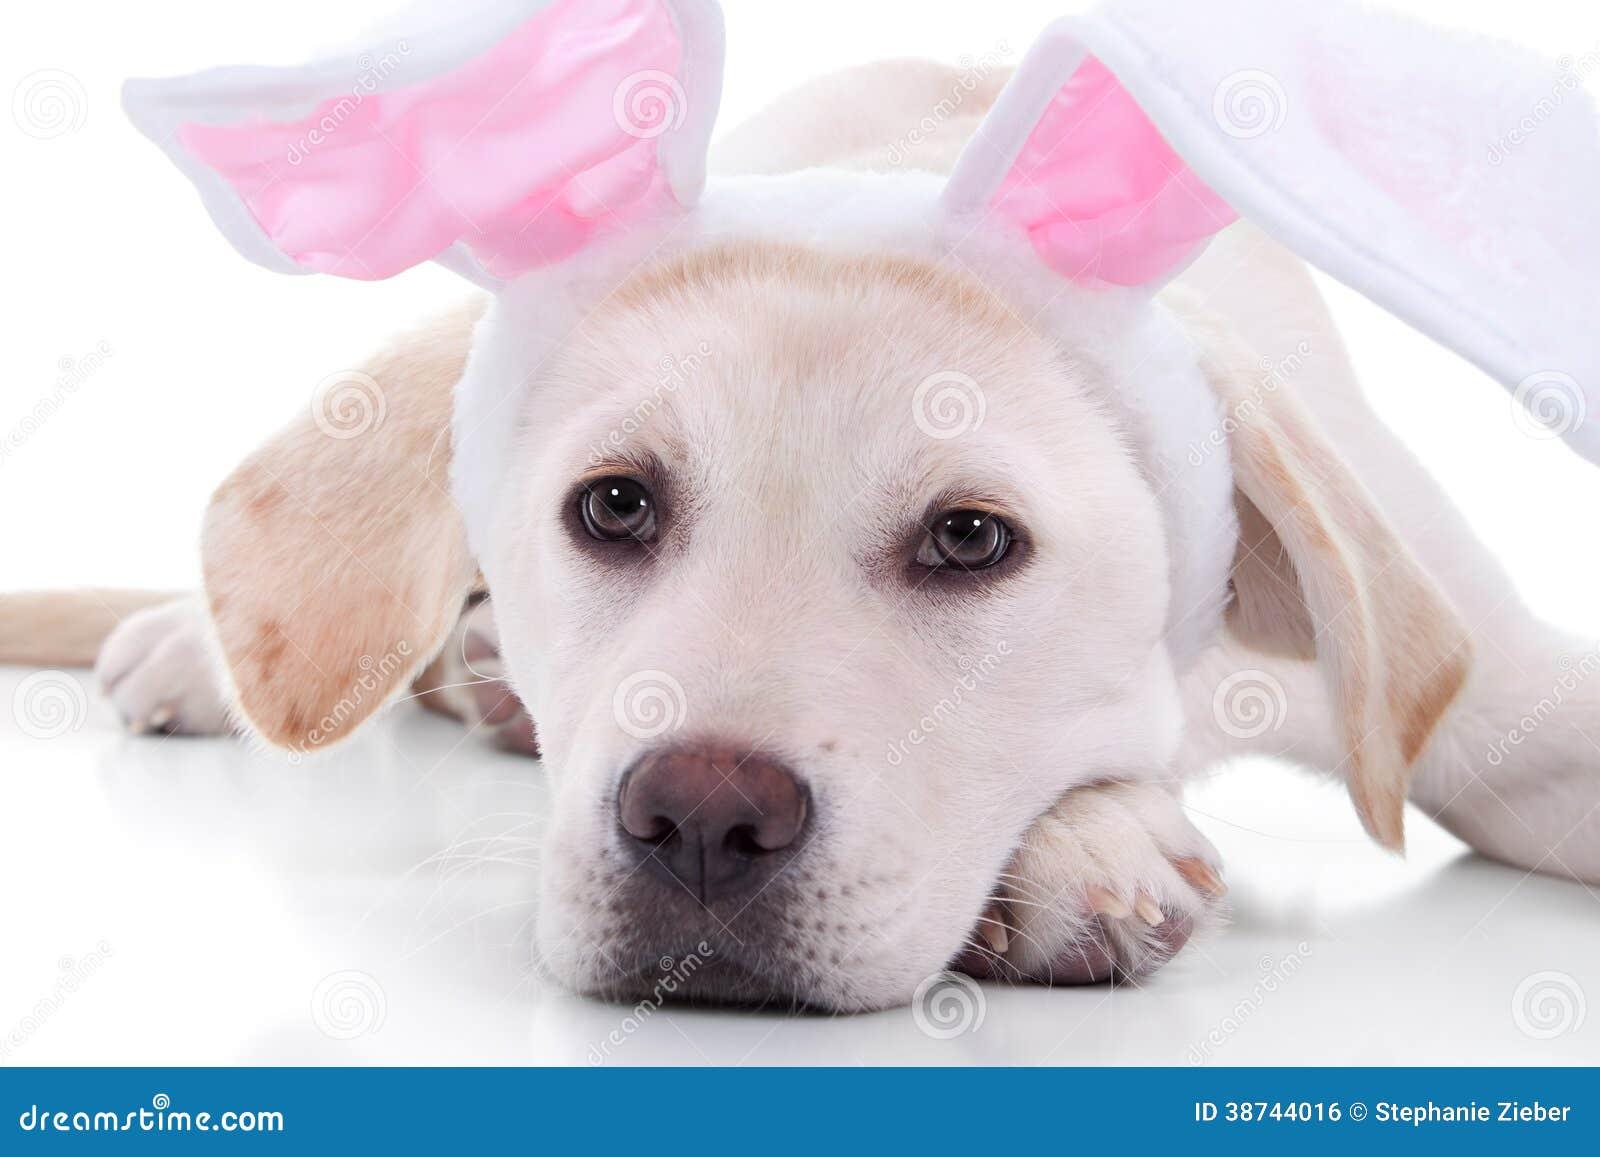 easter bunny dog royalty free stock image image 38744016